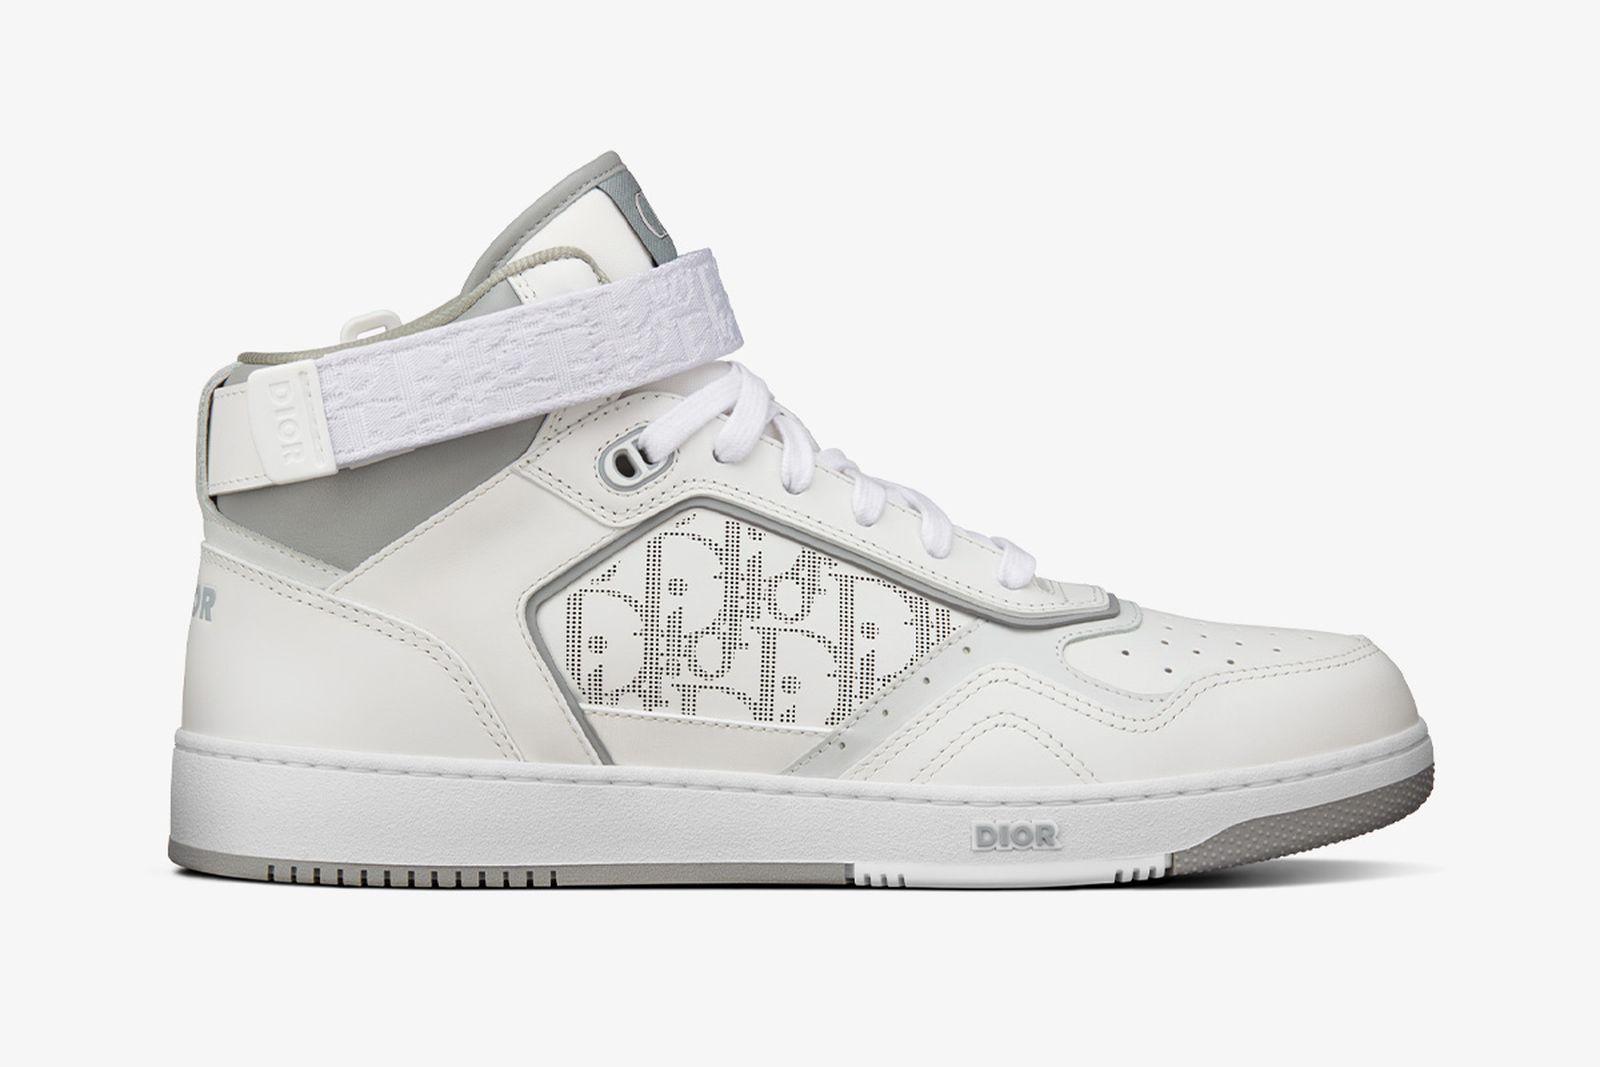 dior-b27-sneaker-release-date-price-03